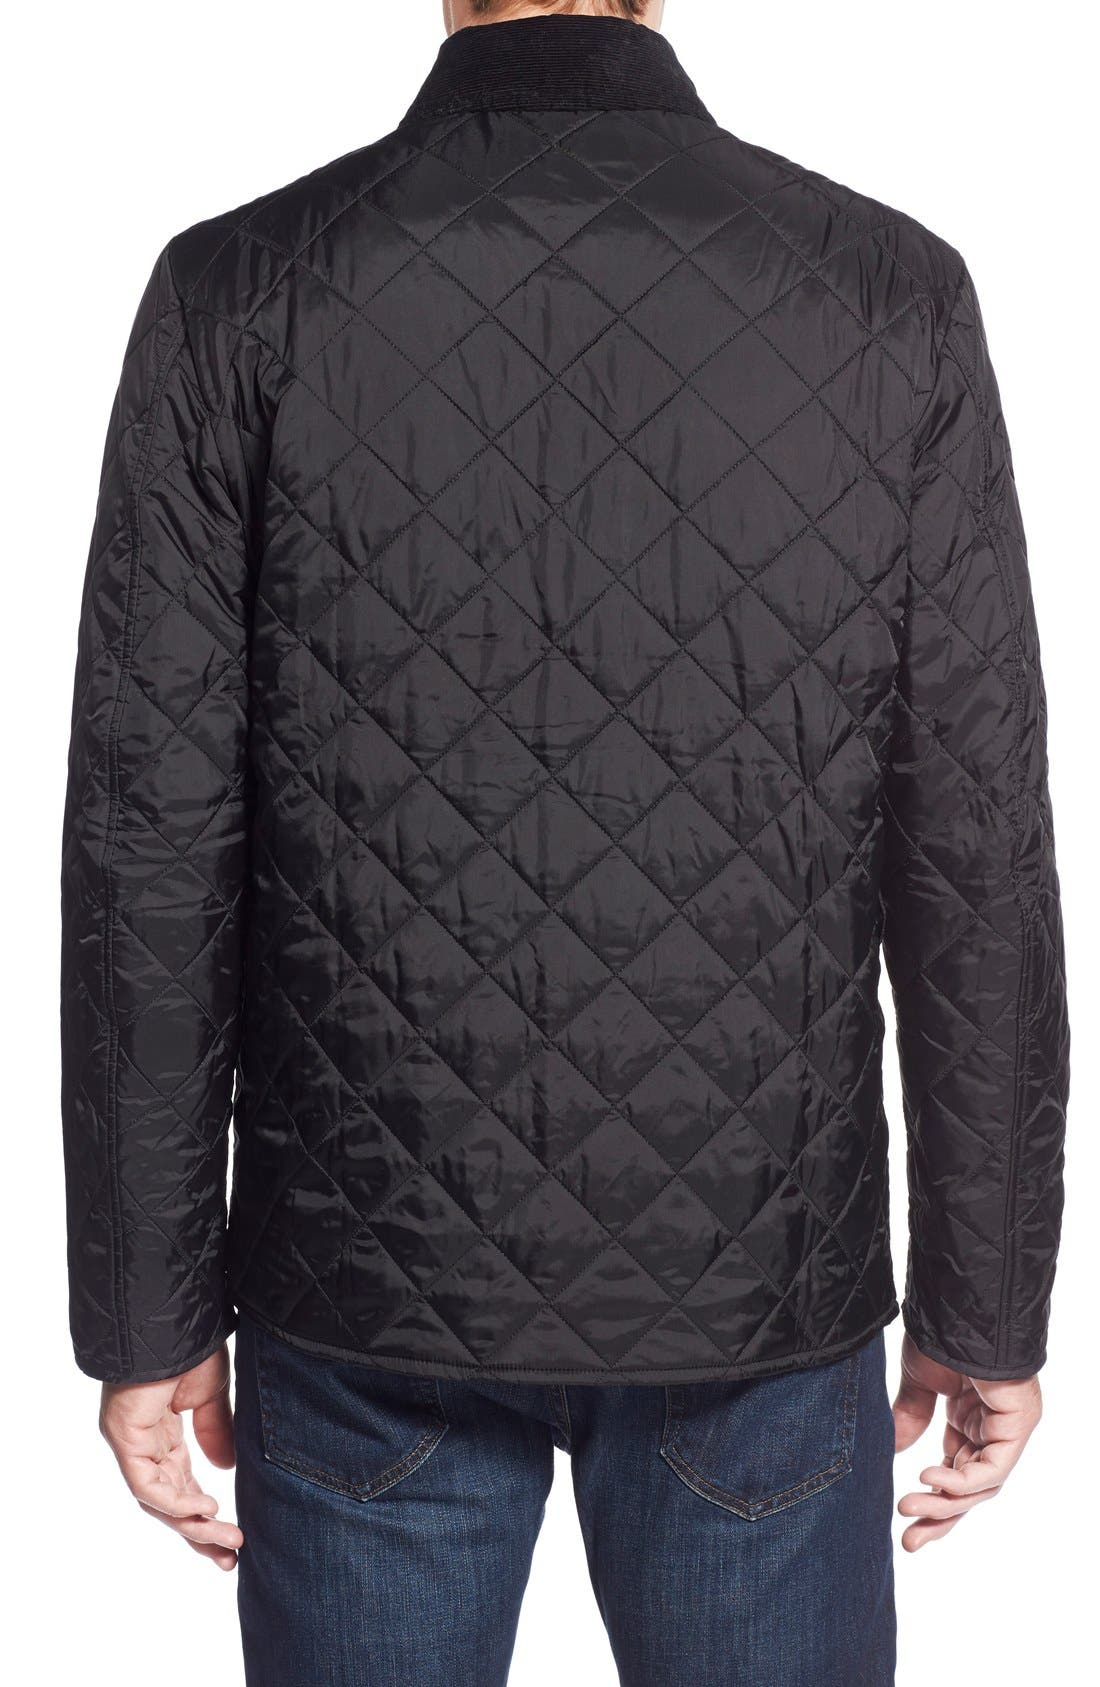 BARBOUR, 'Tinford' Regular Fit Quilted Jacket, Alternate thumbnail 2, color, 001